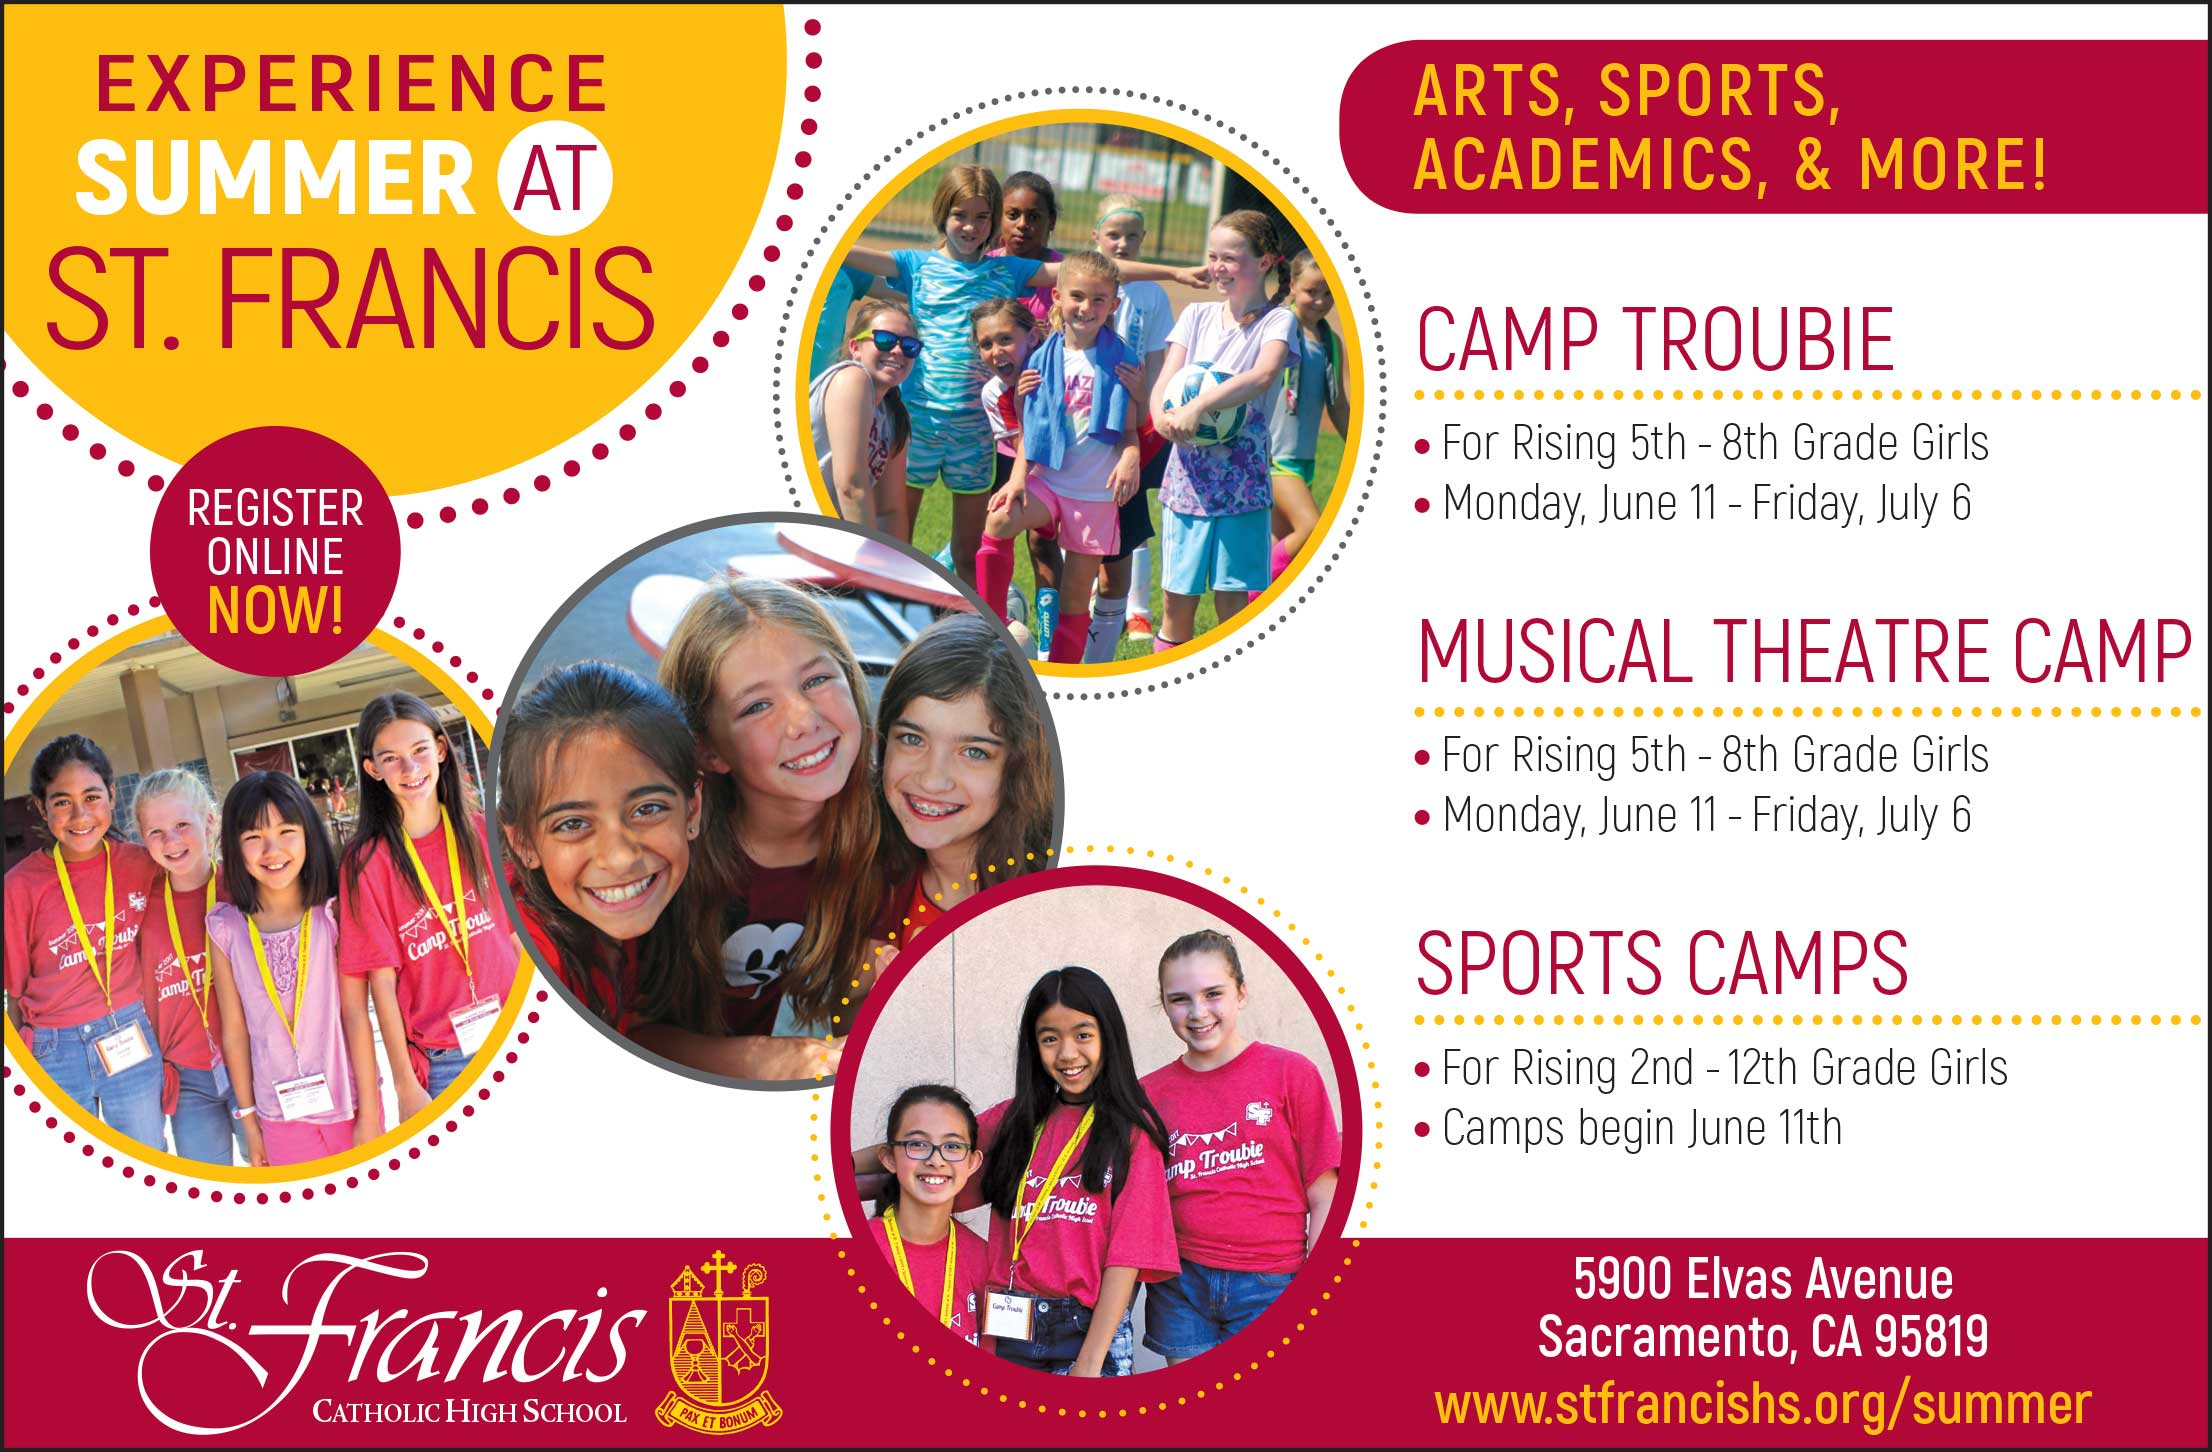 Summer programs 2018 st. Francis catholic high school.